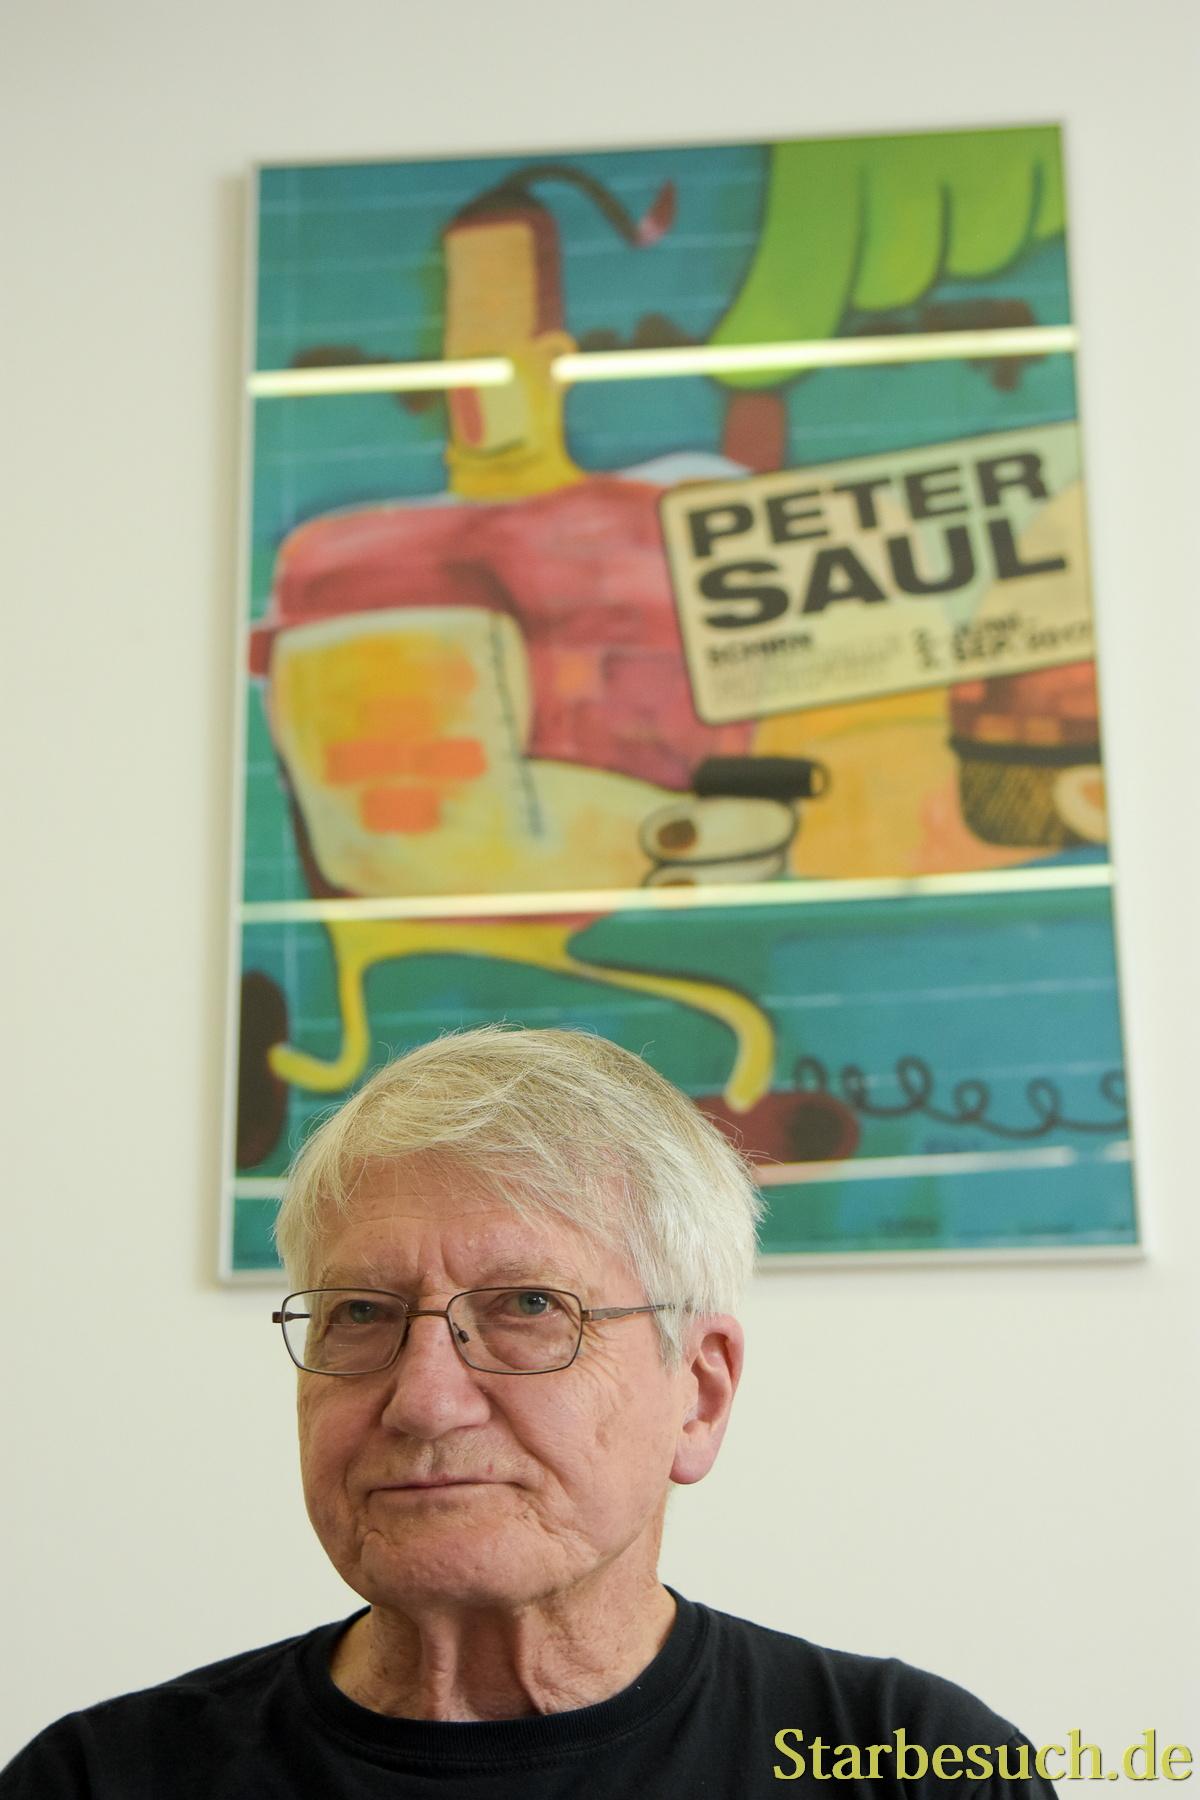 Frankfurt, Germany. 1st Jun, 2017. Peter Saul, US Artist, Exhibition Opening  at Schirn in Frankfurt Germany